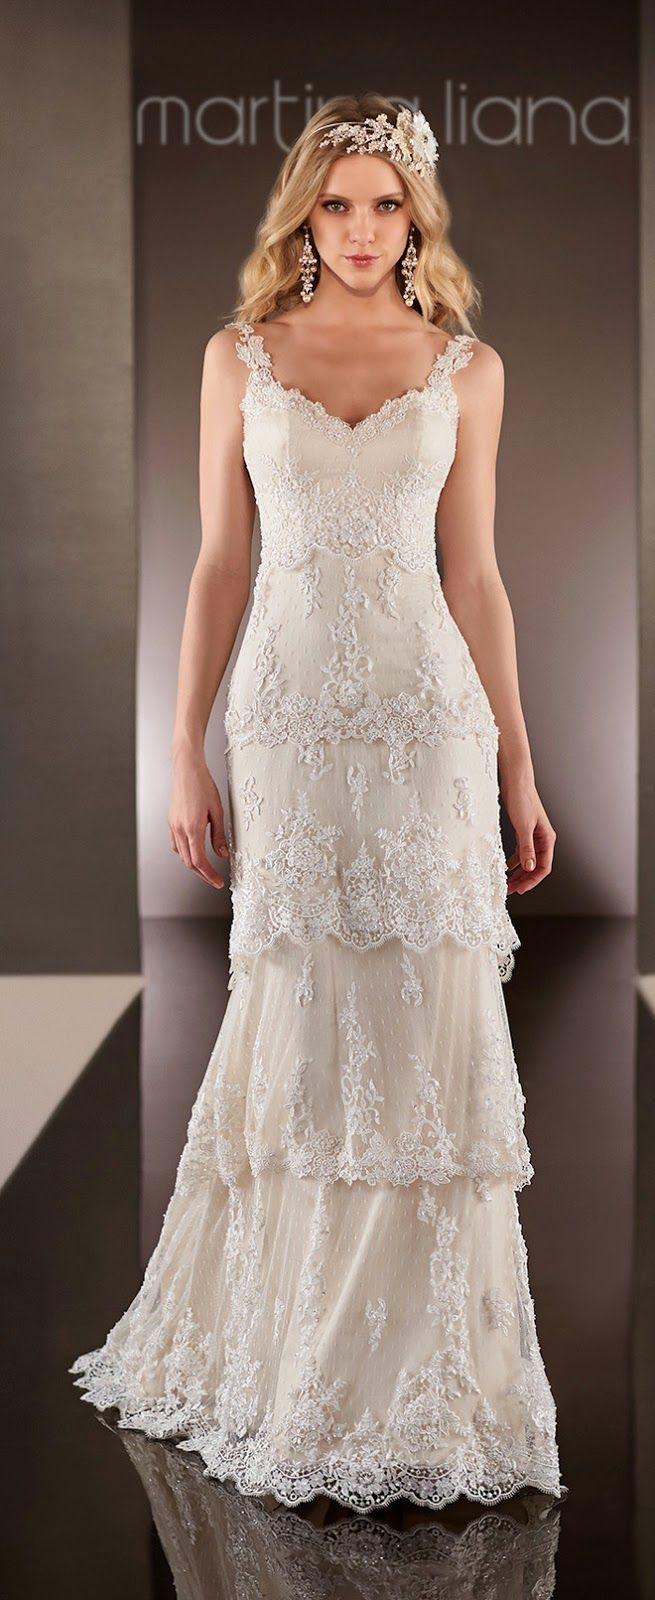 Martina Liana Spring 2015 Bridal Collection | bellethemagazine.com